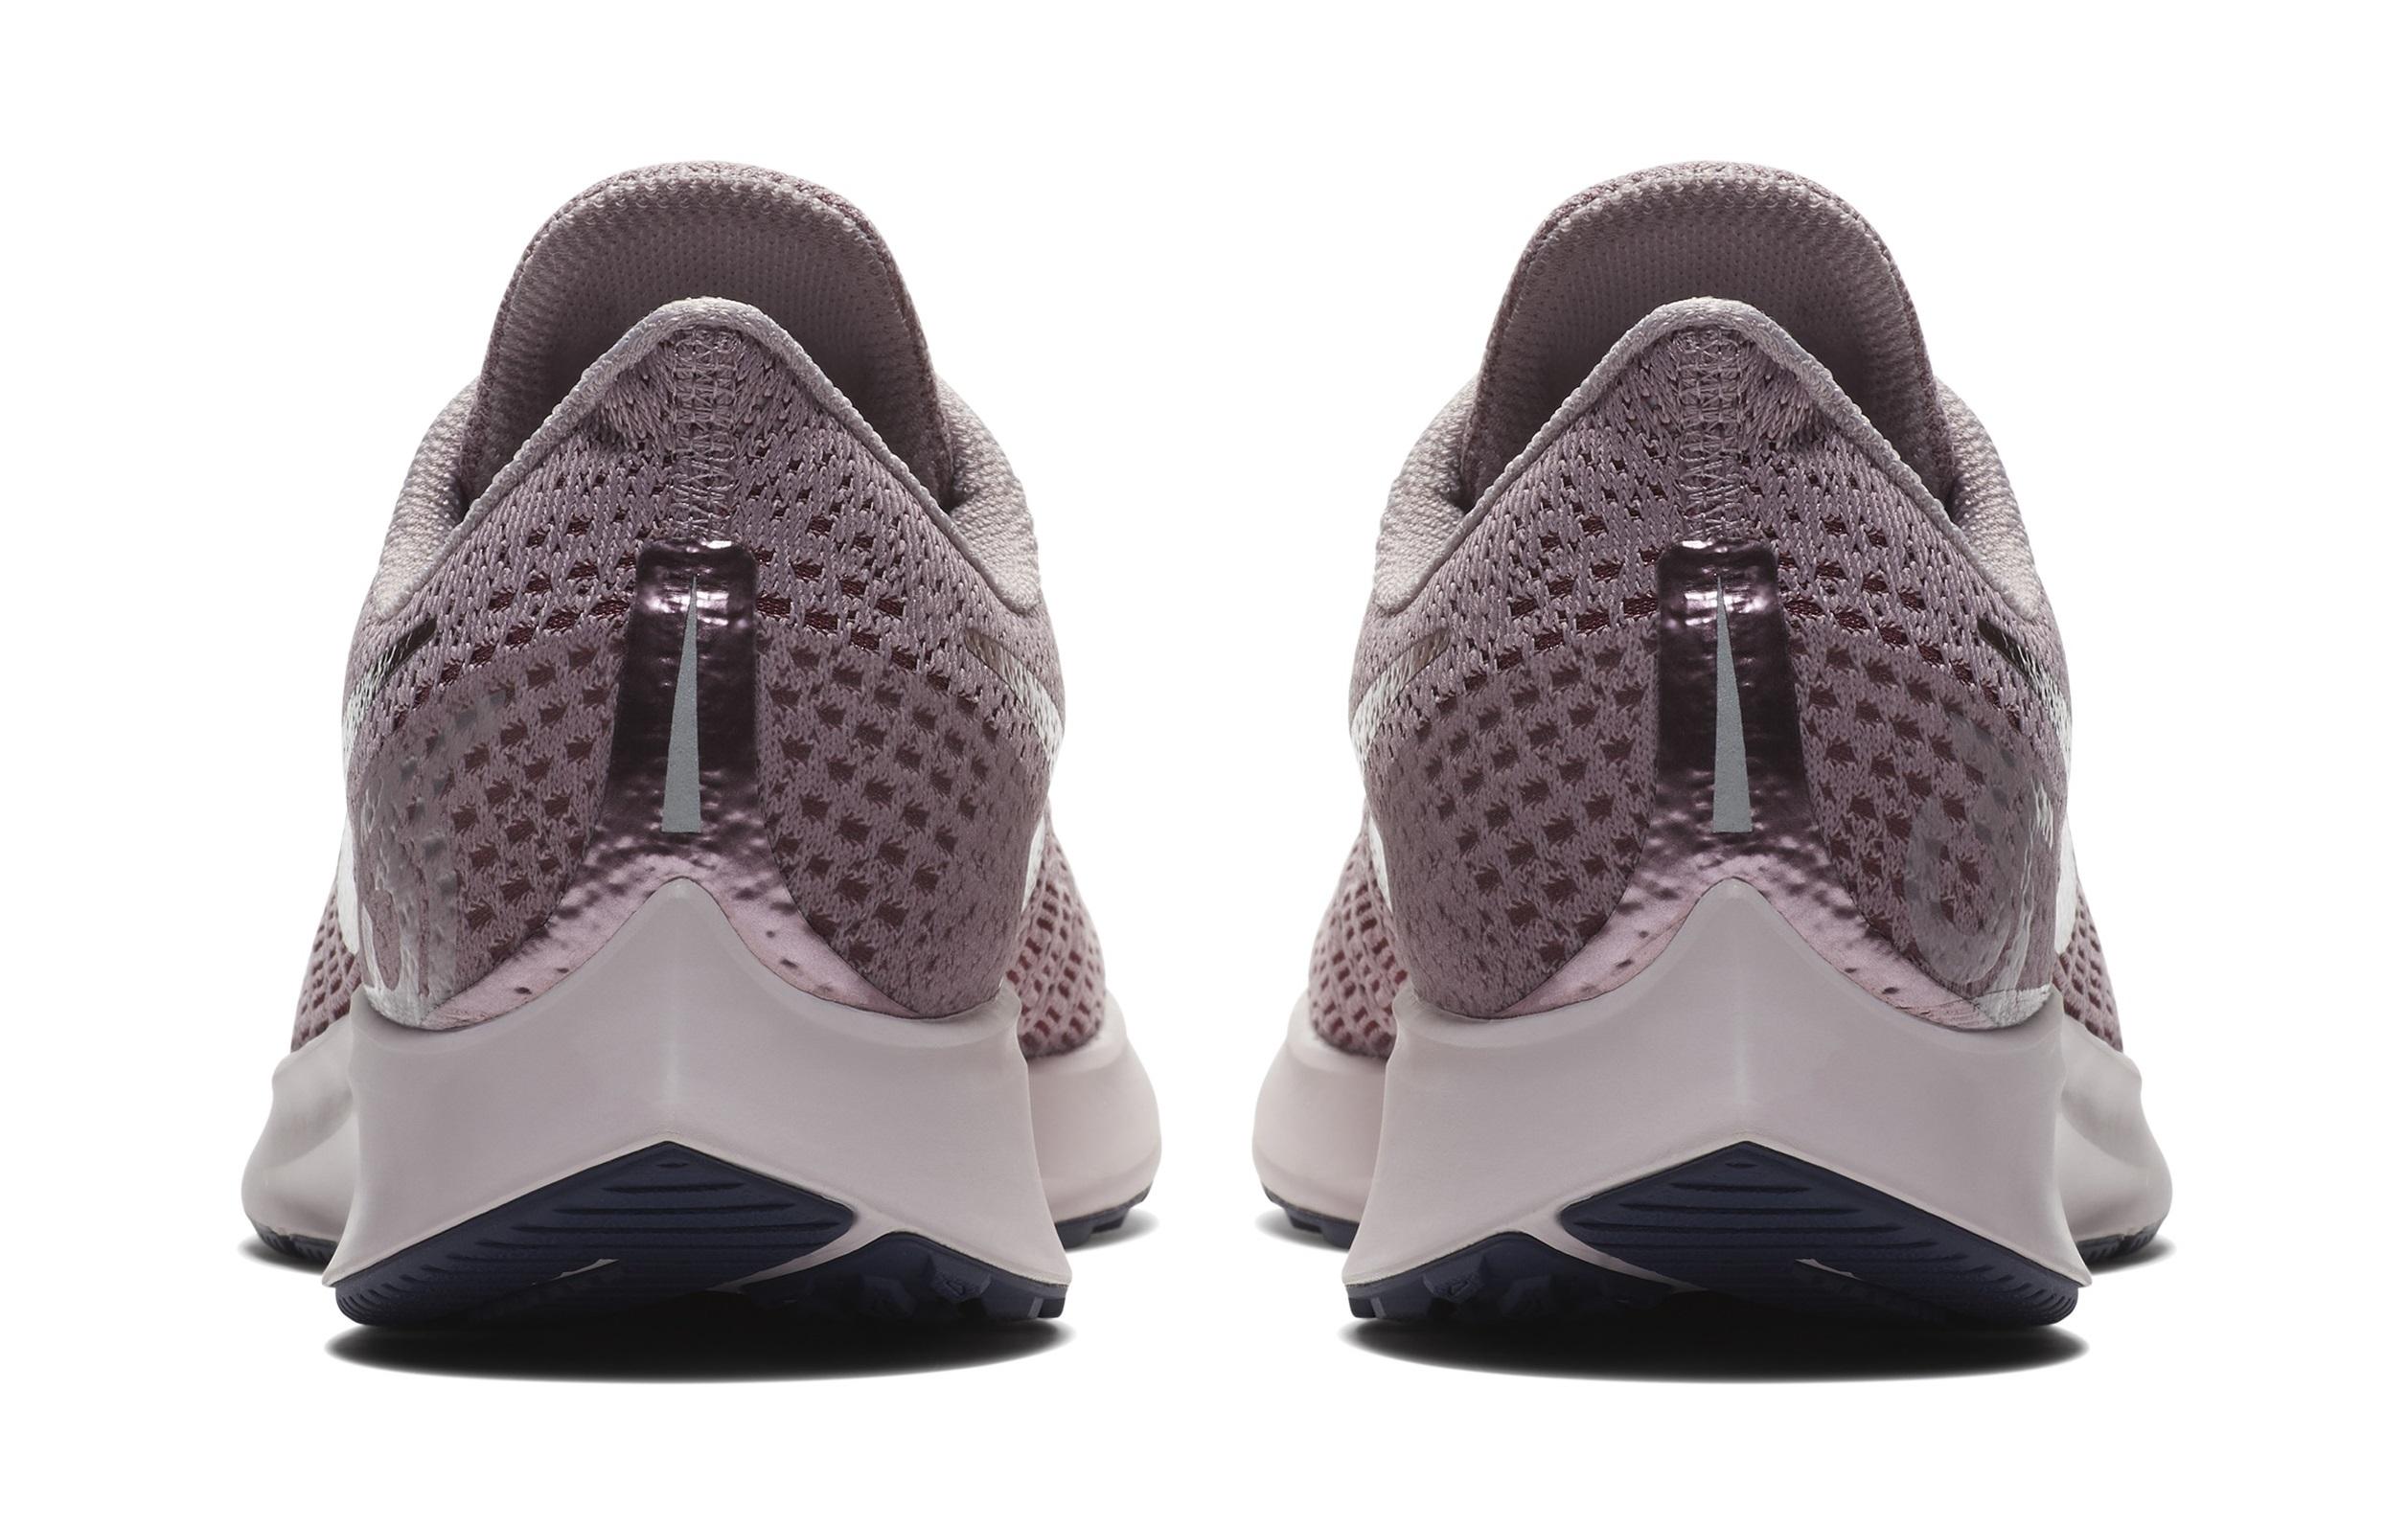 Nike Pegasus 32 Locos Por Correr 03